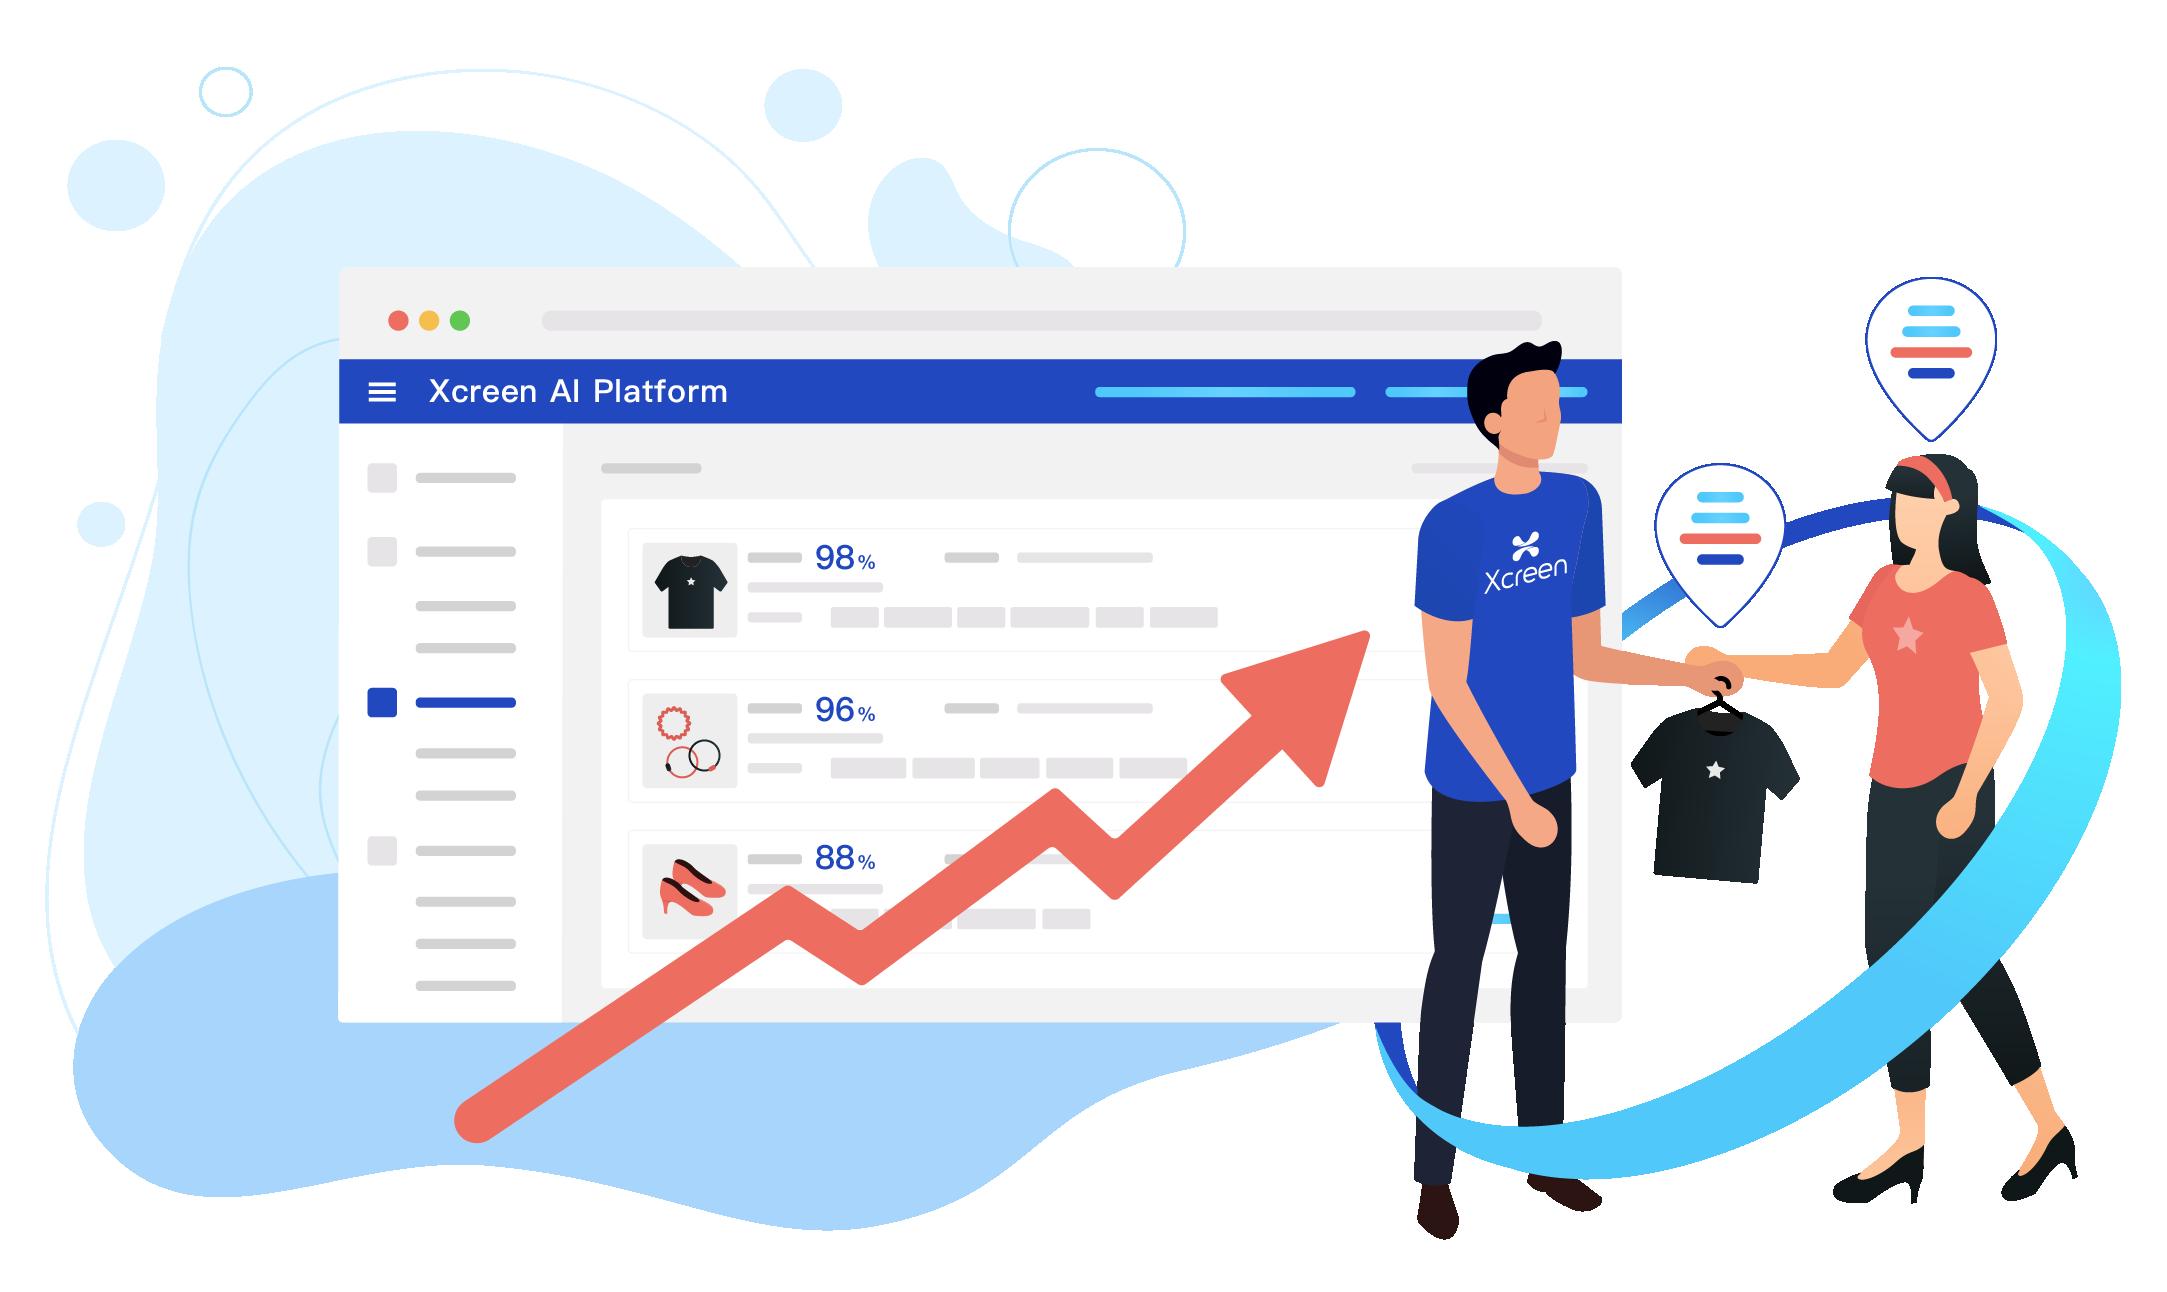 AI智能廣告看板搜集顧客大數據,提供廣告最佳化標籤,提昇受眾精準度。